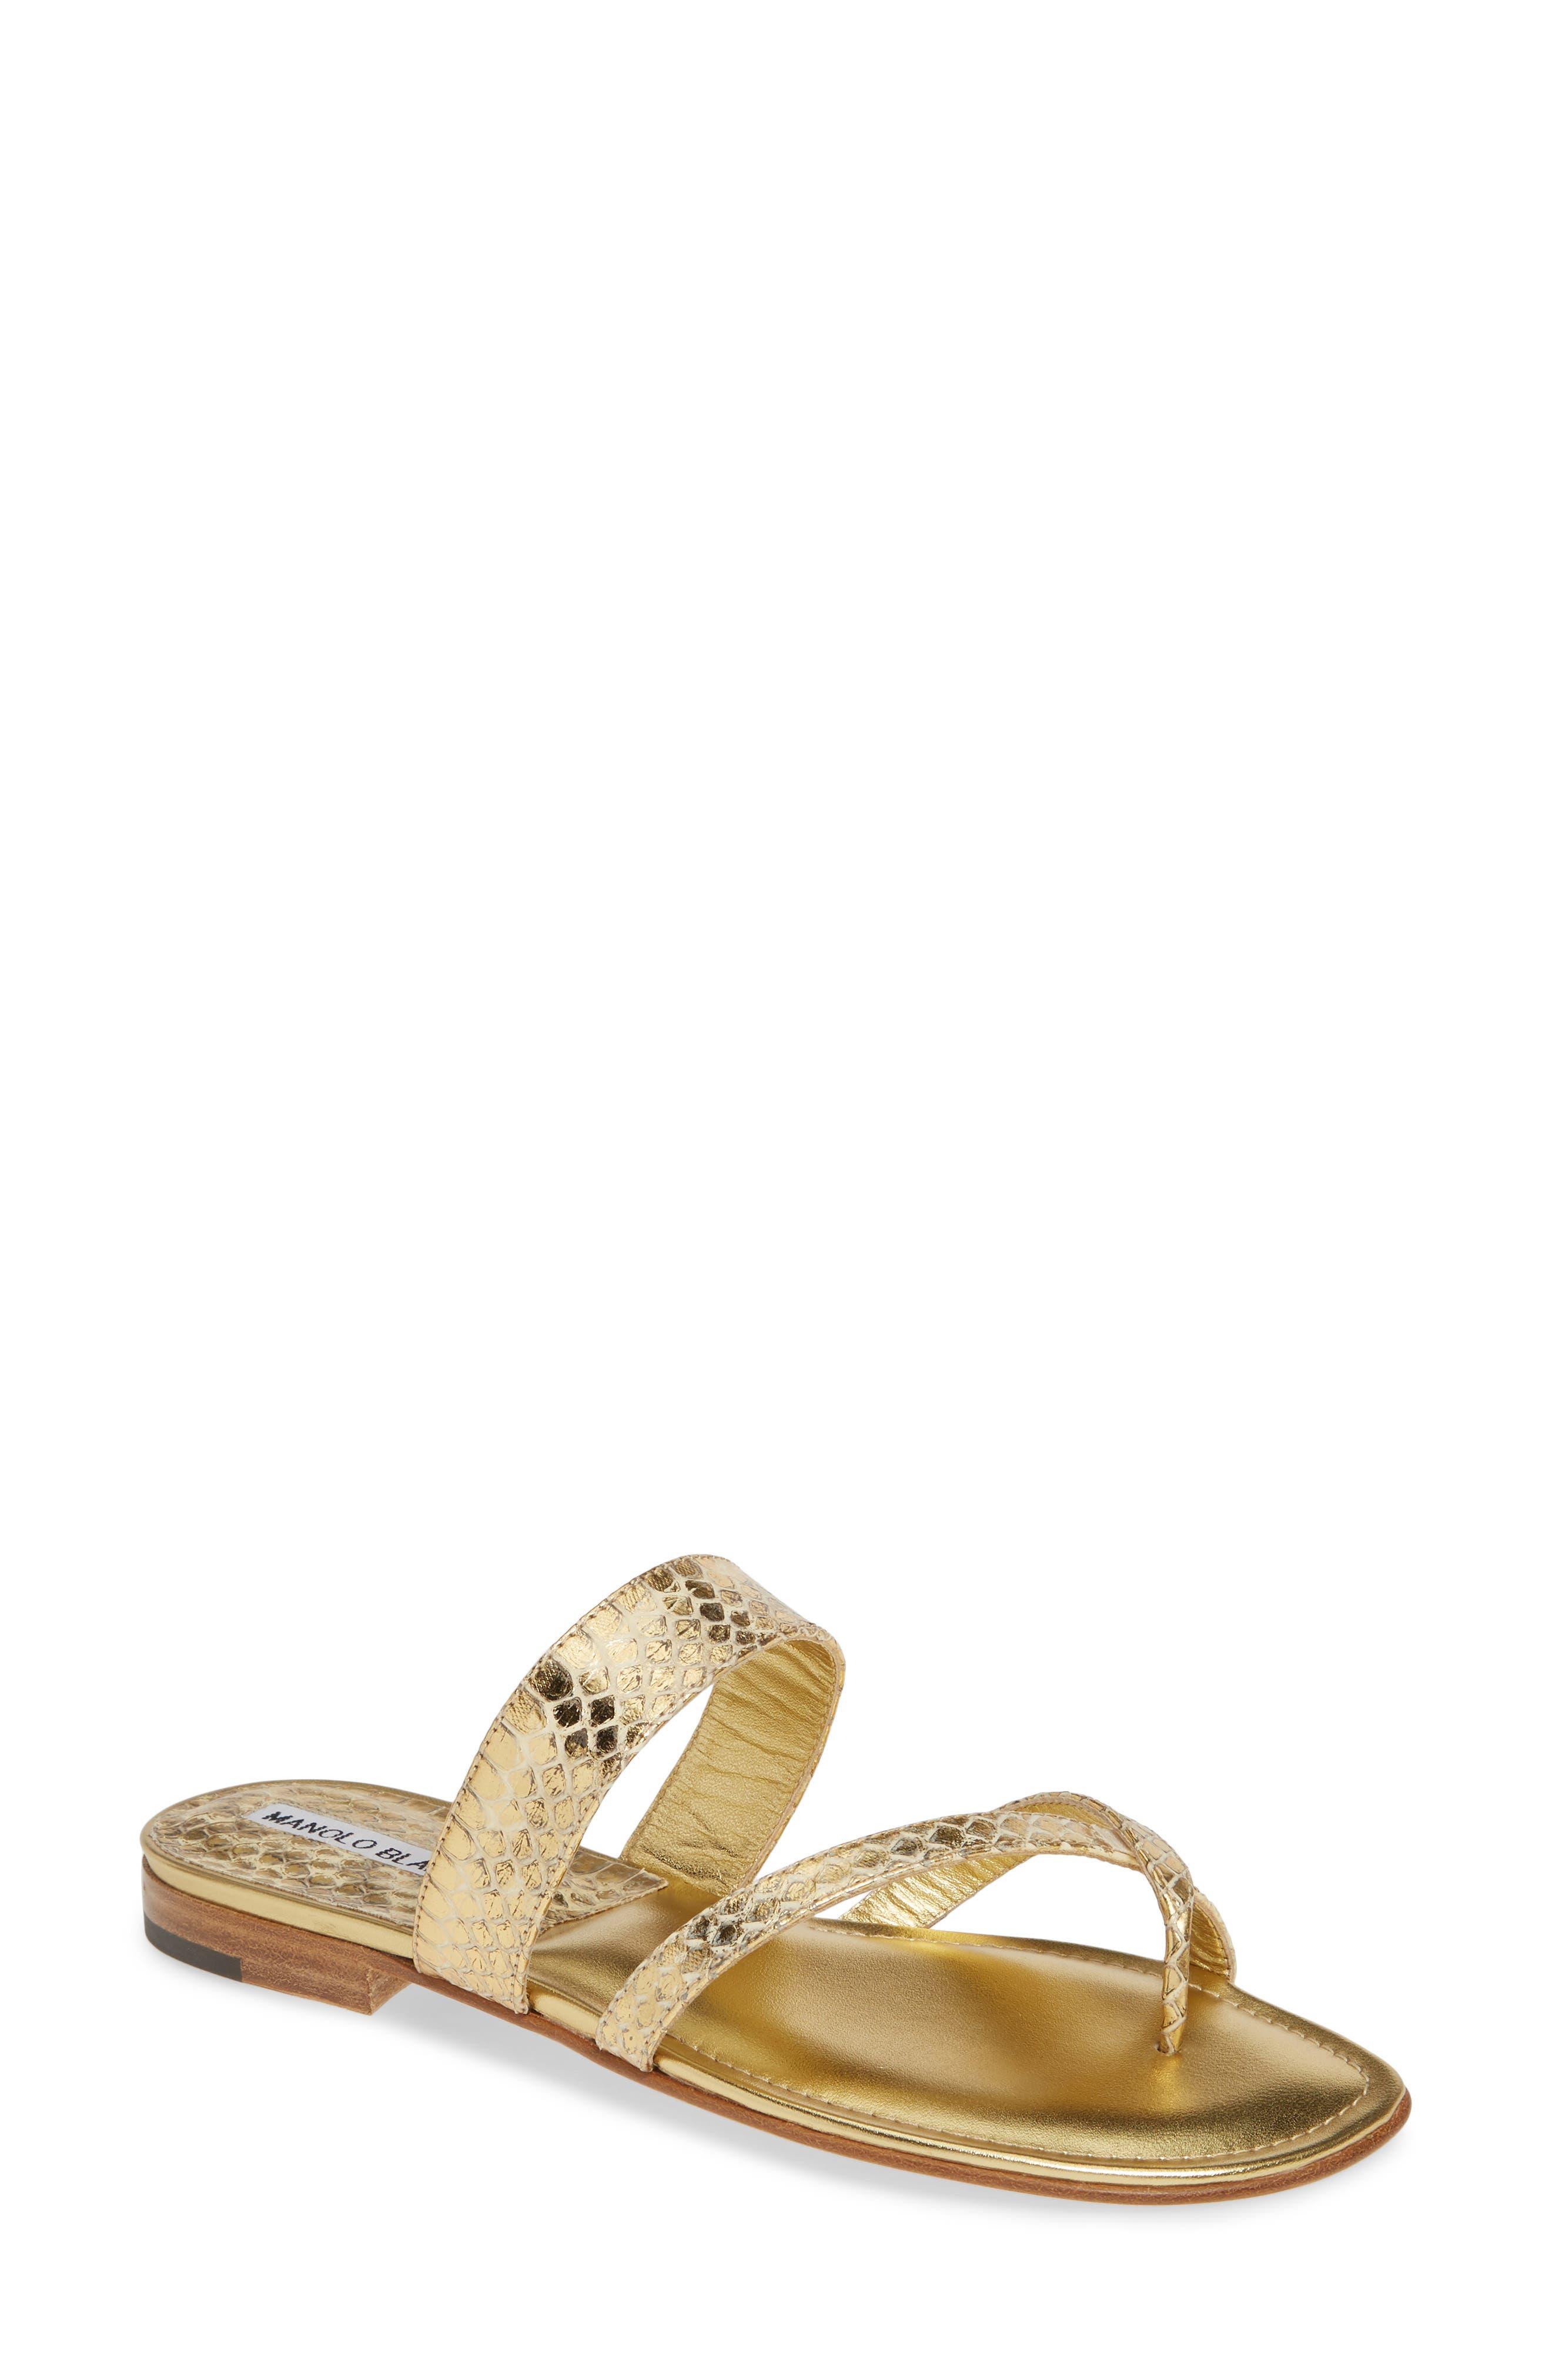 MANOLO BLAHNIK 'Susa' Genuine Snakeskin Sandal, Main, color, GOLD WATERSNAKE